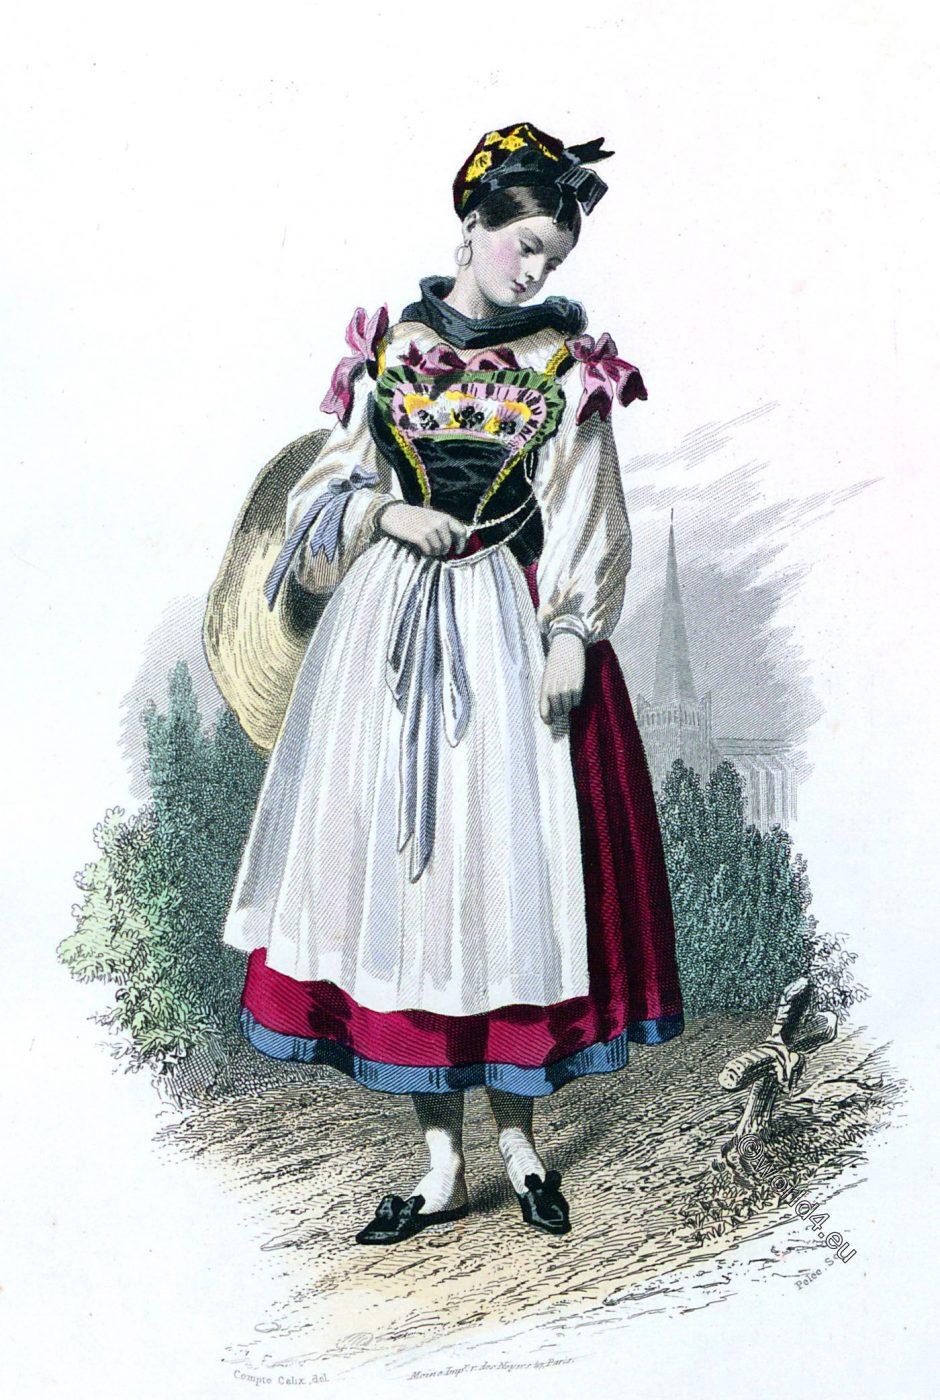 Alsace, Neuwiller-lès-Saverne, costume, traditional, France